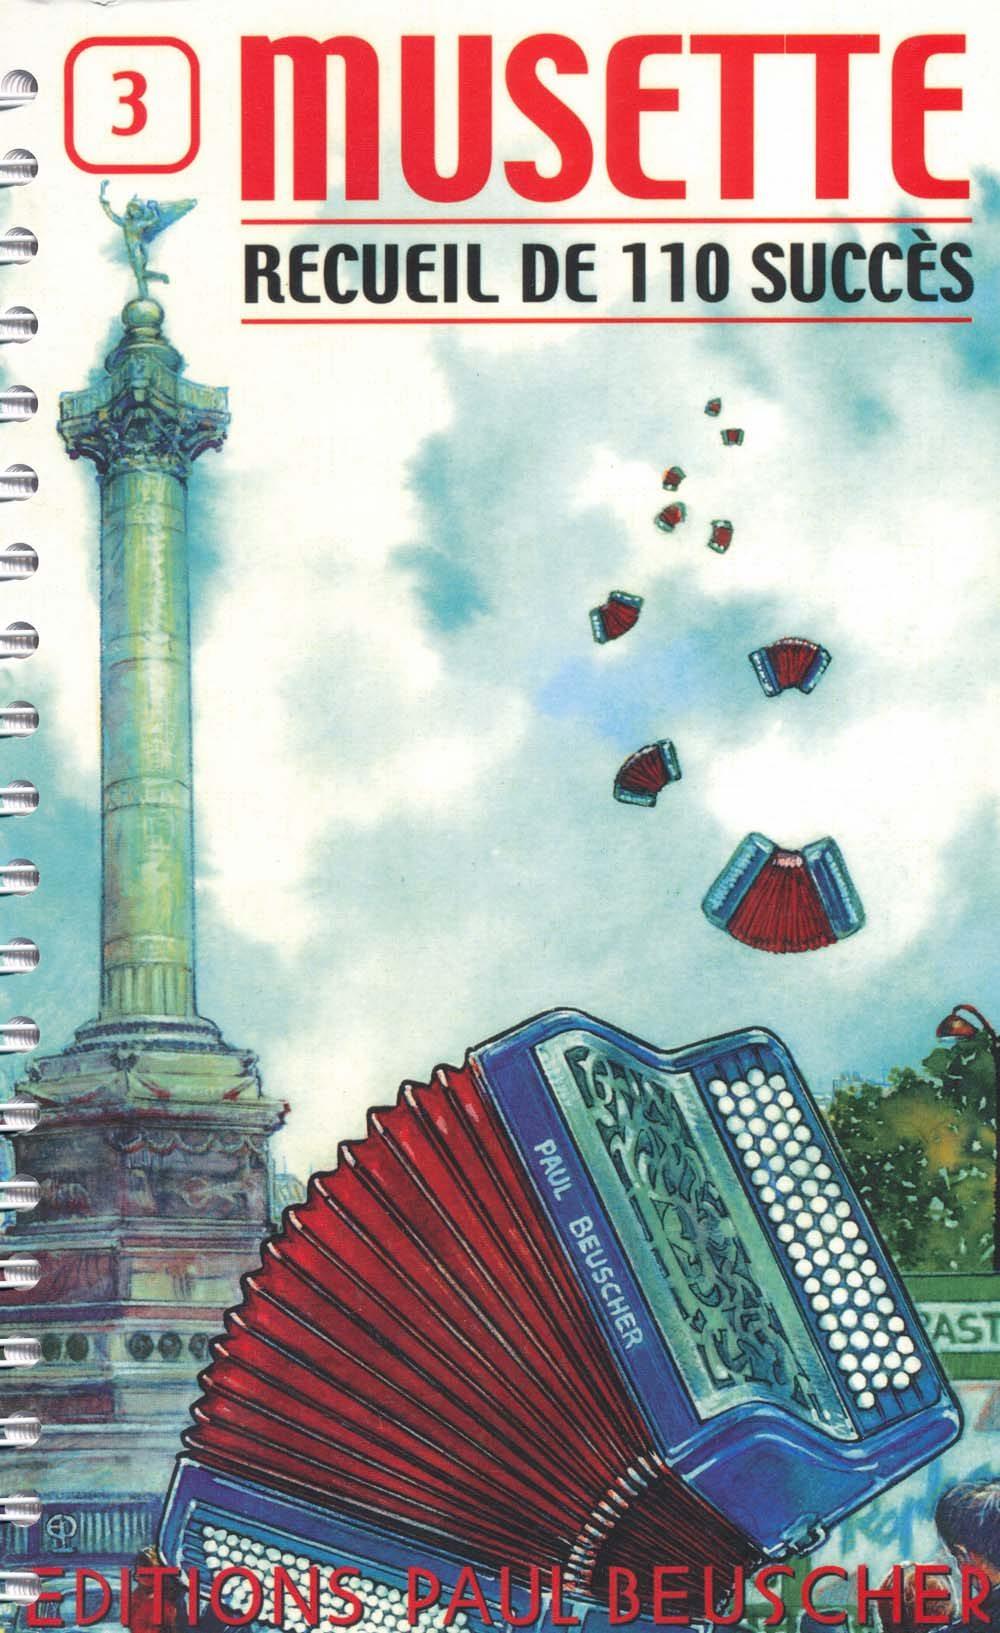 110 Succès Musette - Volume 3